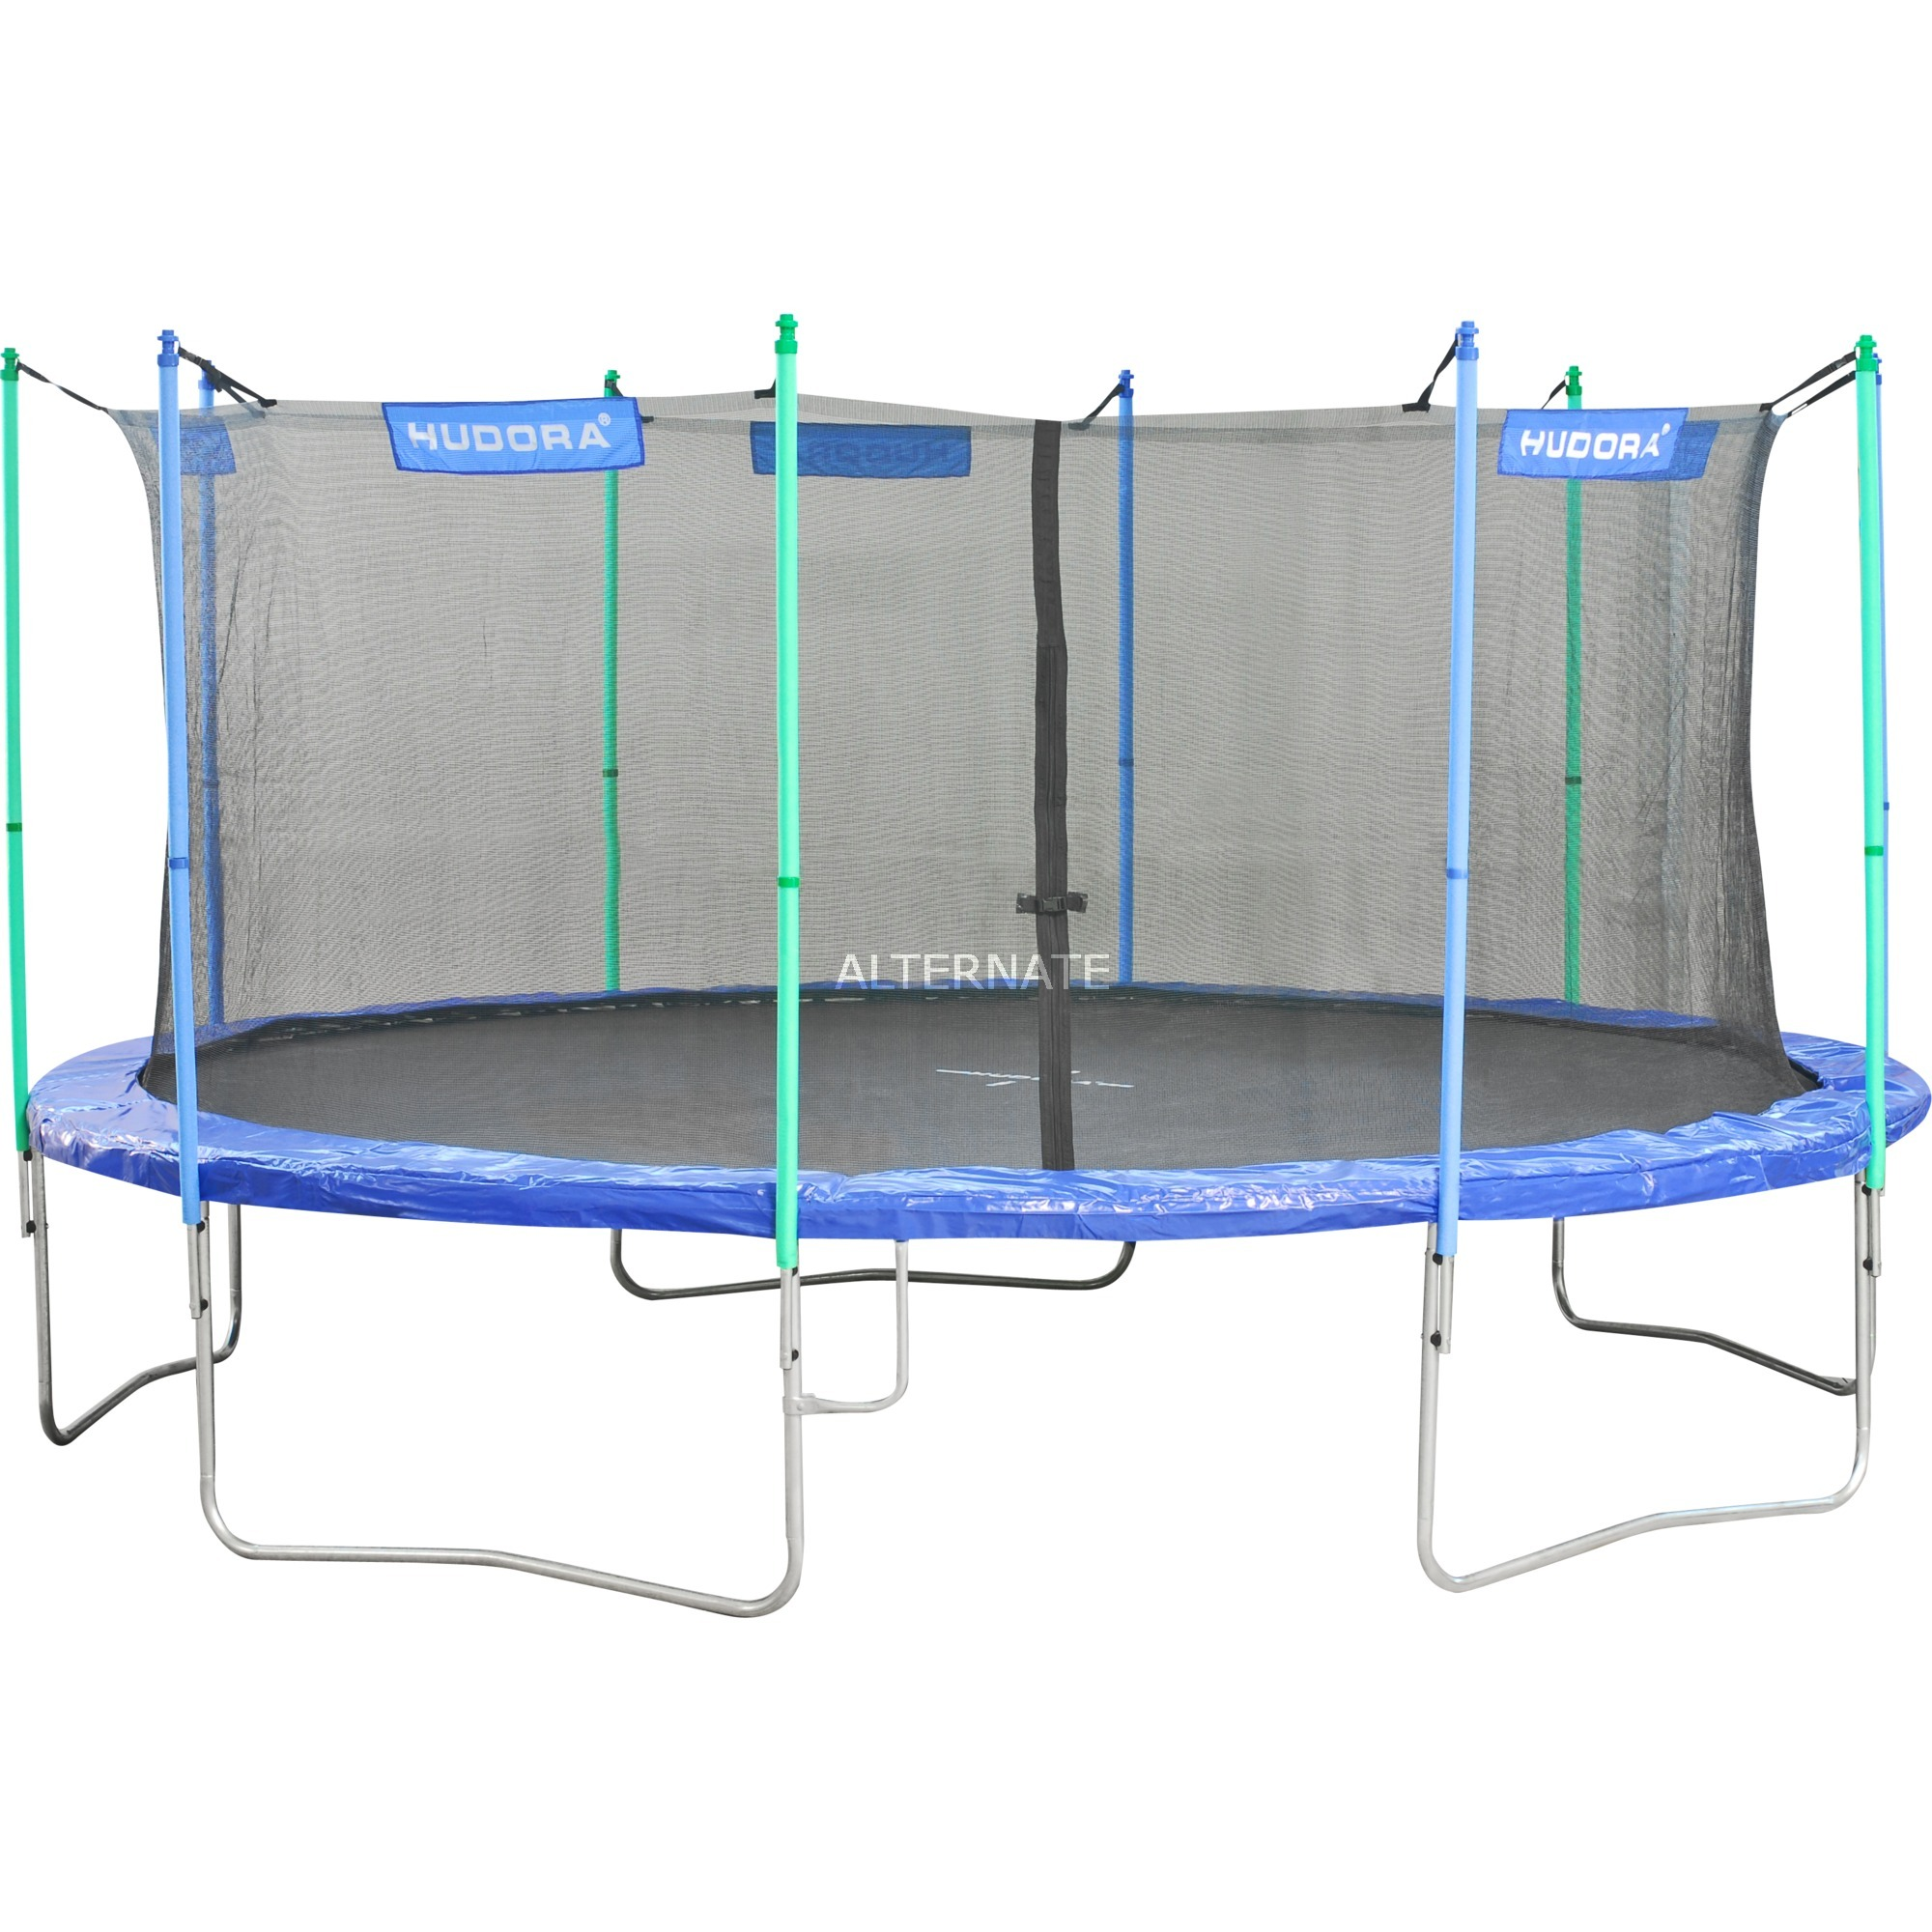 trampolin 400 netz fitness randabdeckung sicherheitsnetz abdeckung prezzo e offerte sottocosto. Black Bedroom Furniture Sets. Home Design Ideas